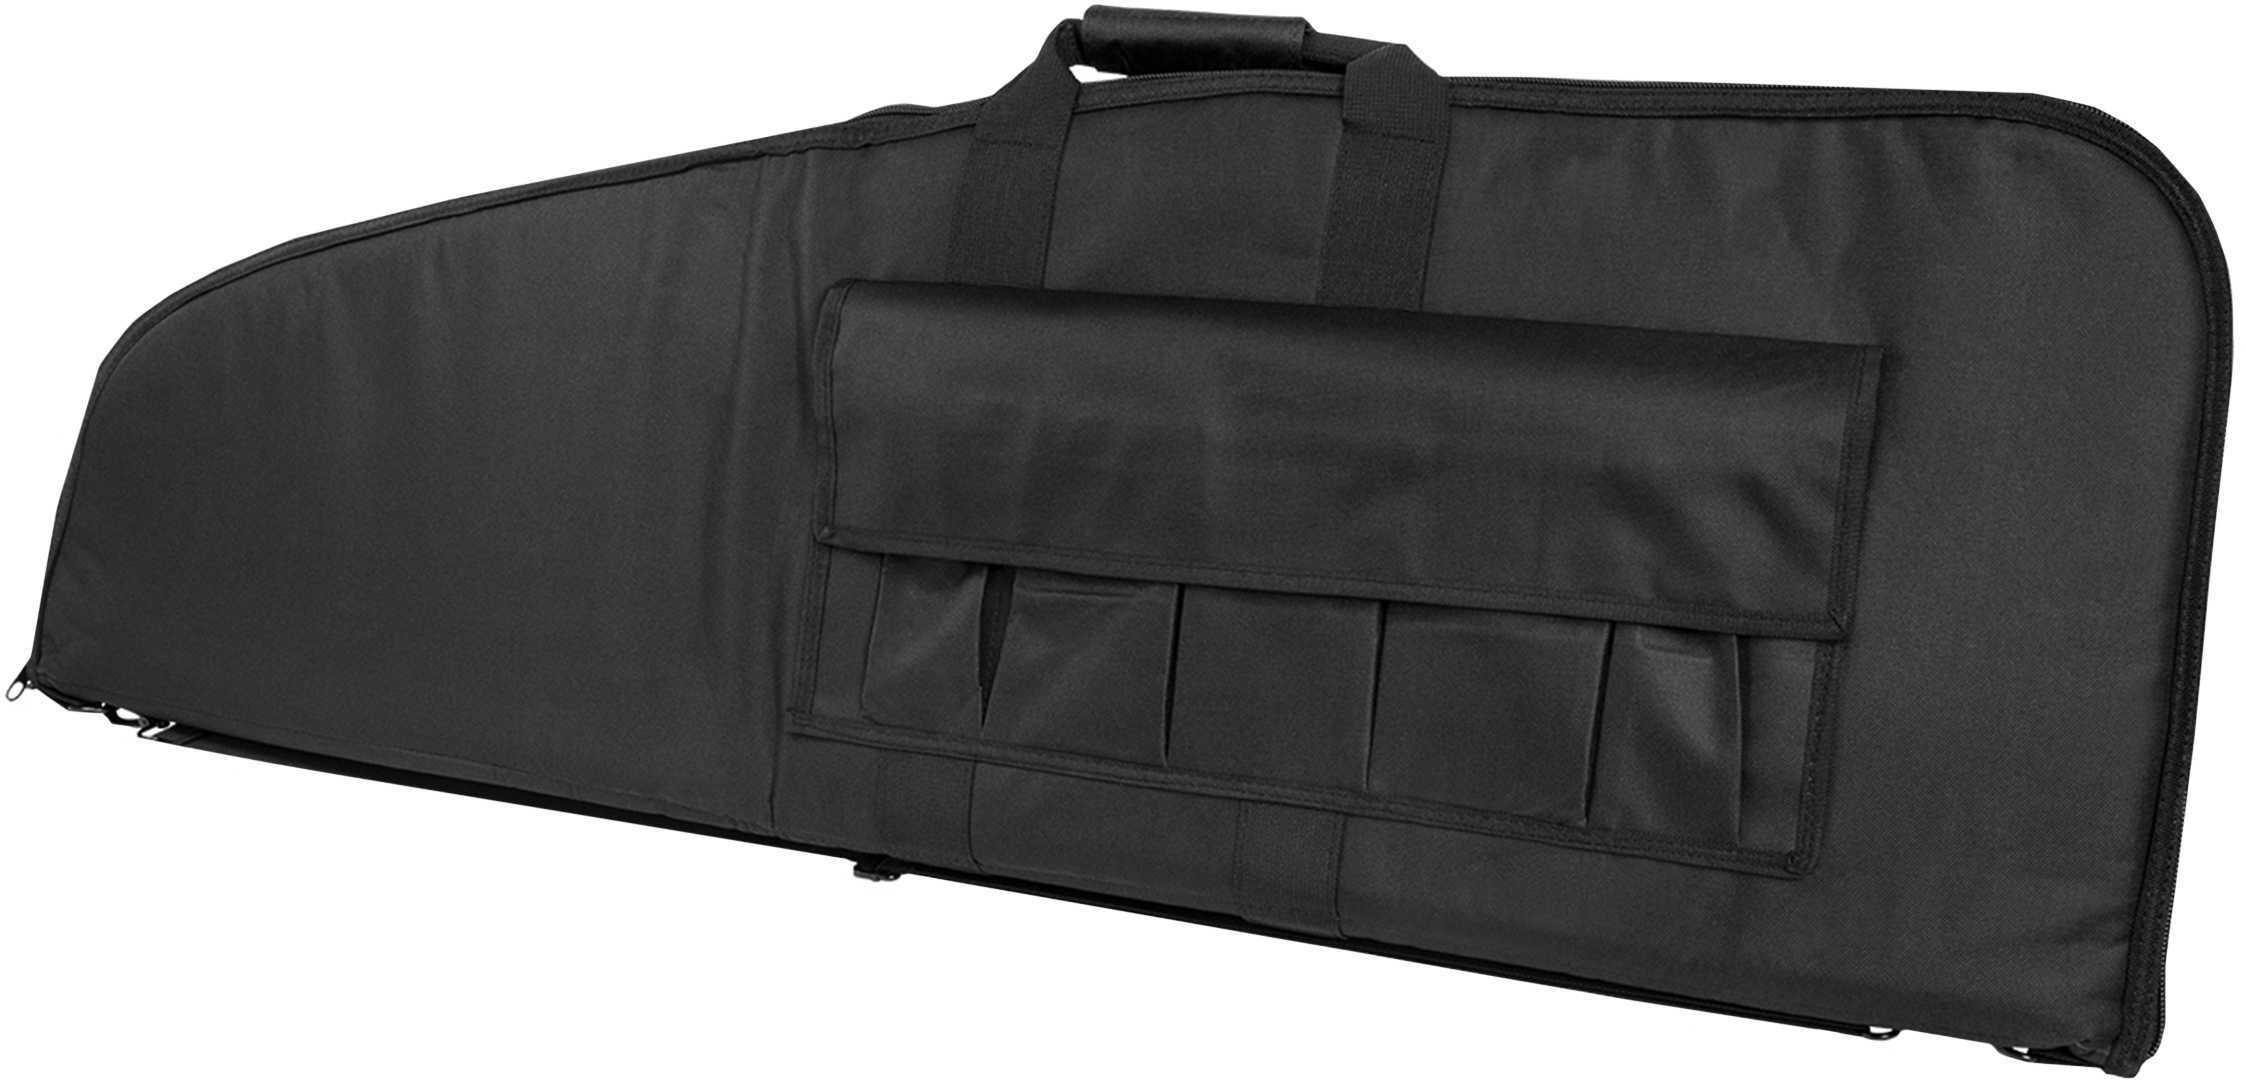 "NCSTAR Scoped Rifle Case Rifle Case Black Nylon 52"" Tall Model CVS2907-52"